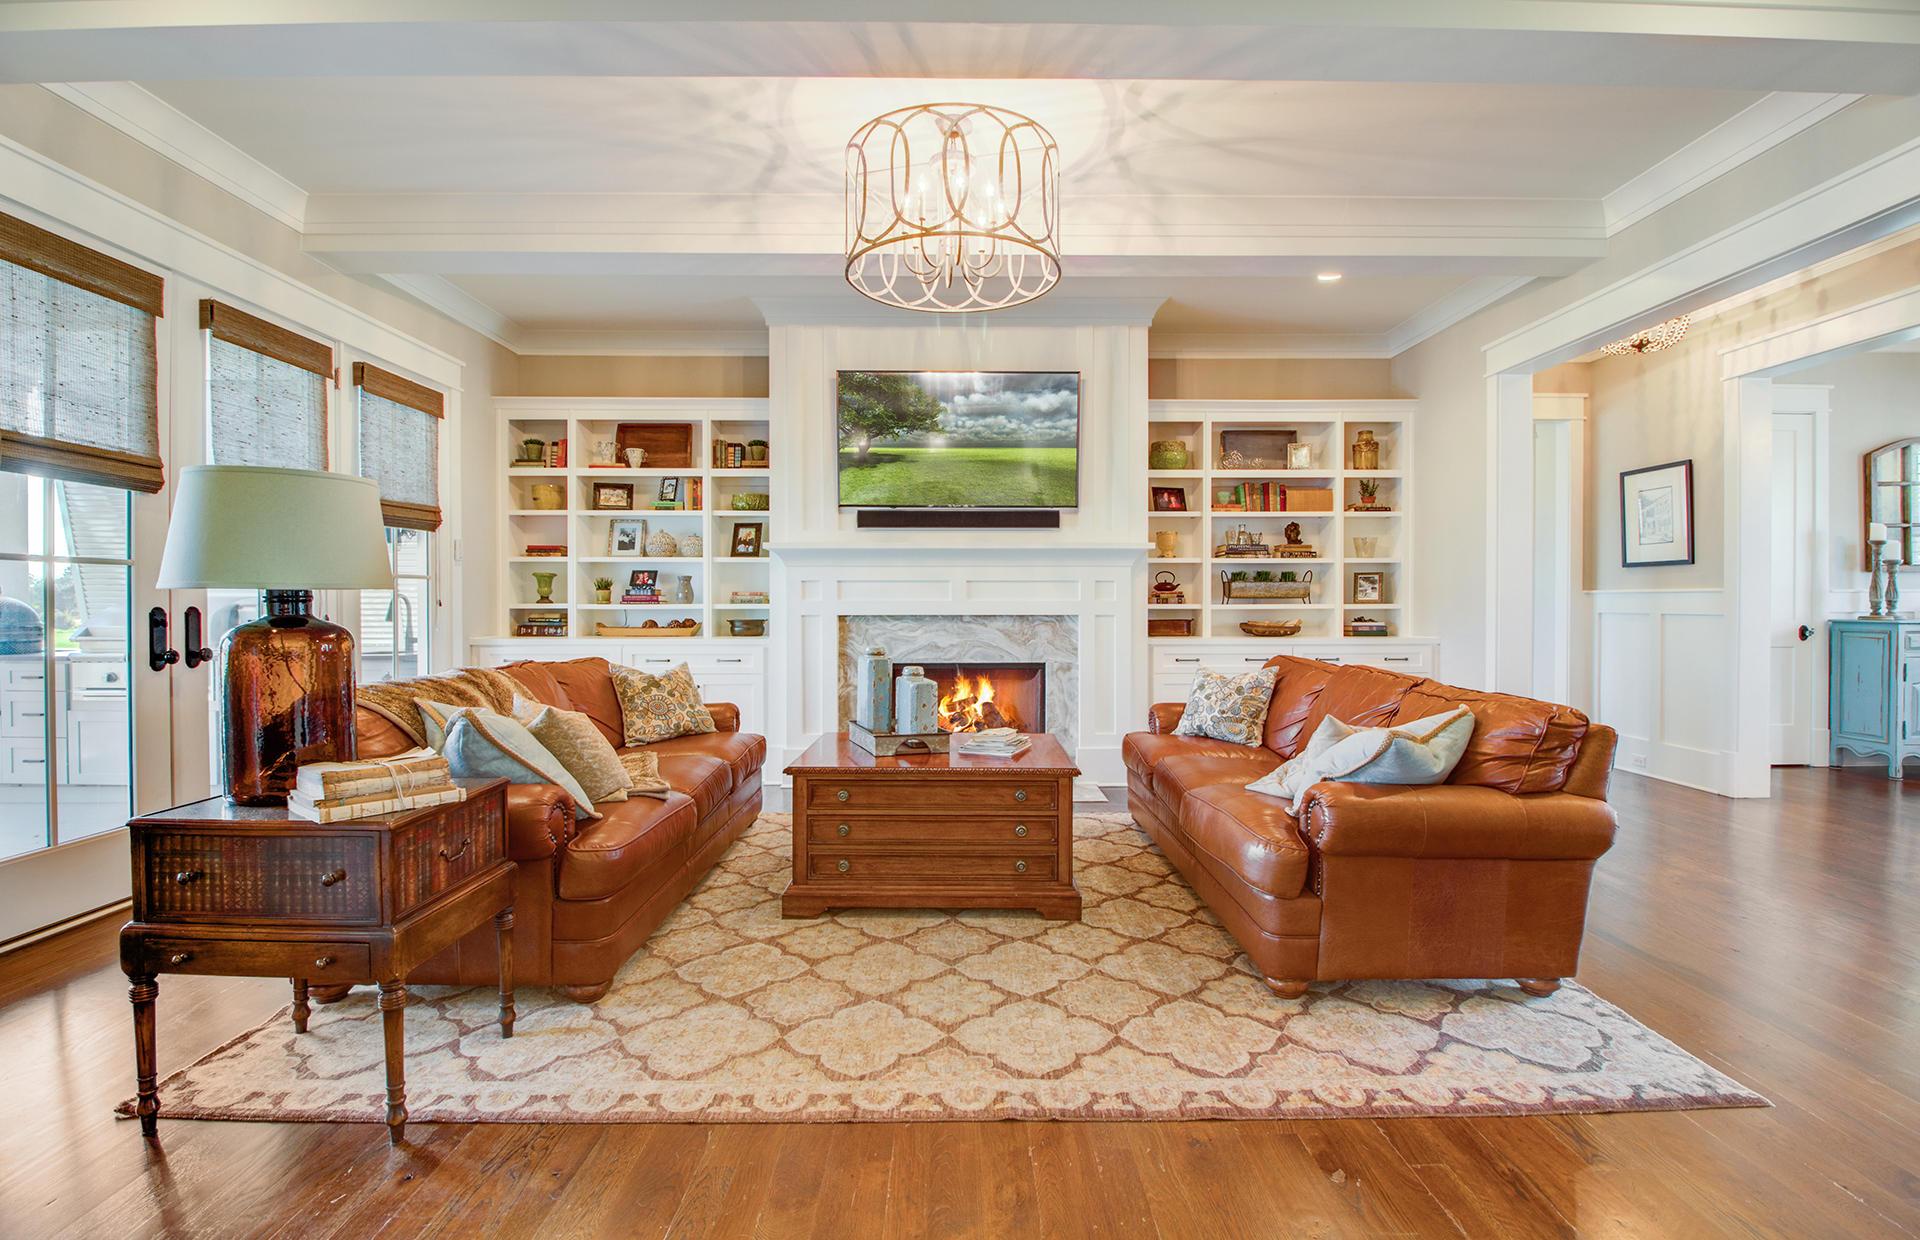 Daniel Island Park Homes For Sale - 117 Brailsford, Charleston, SC - 35